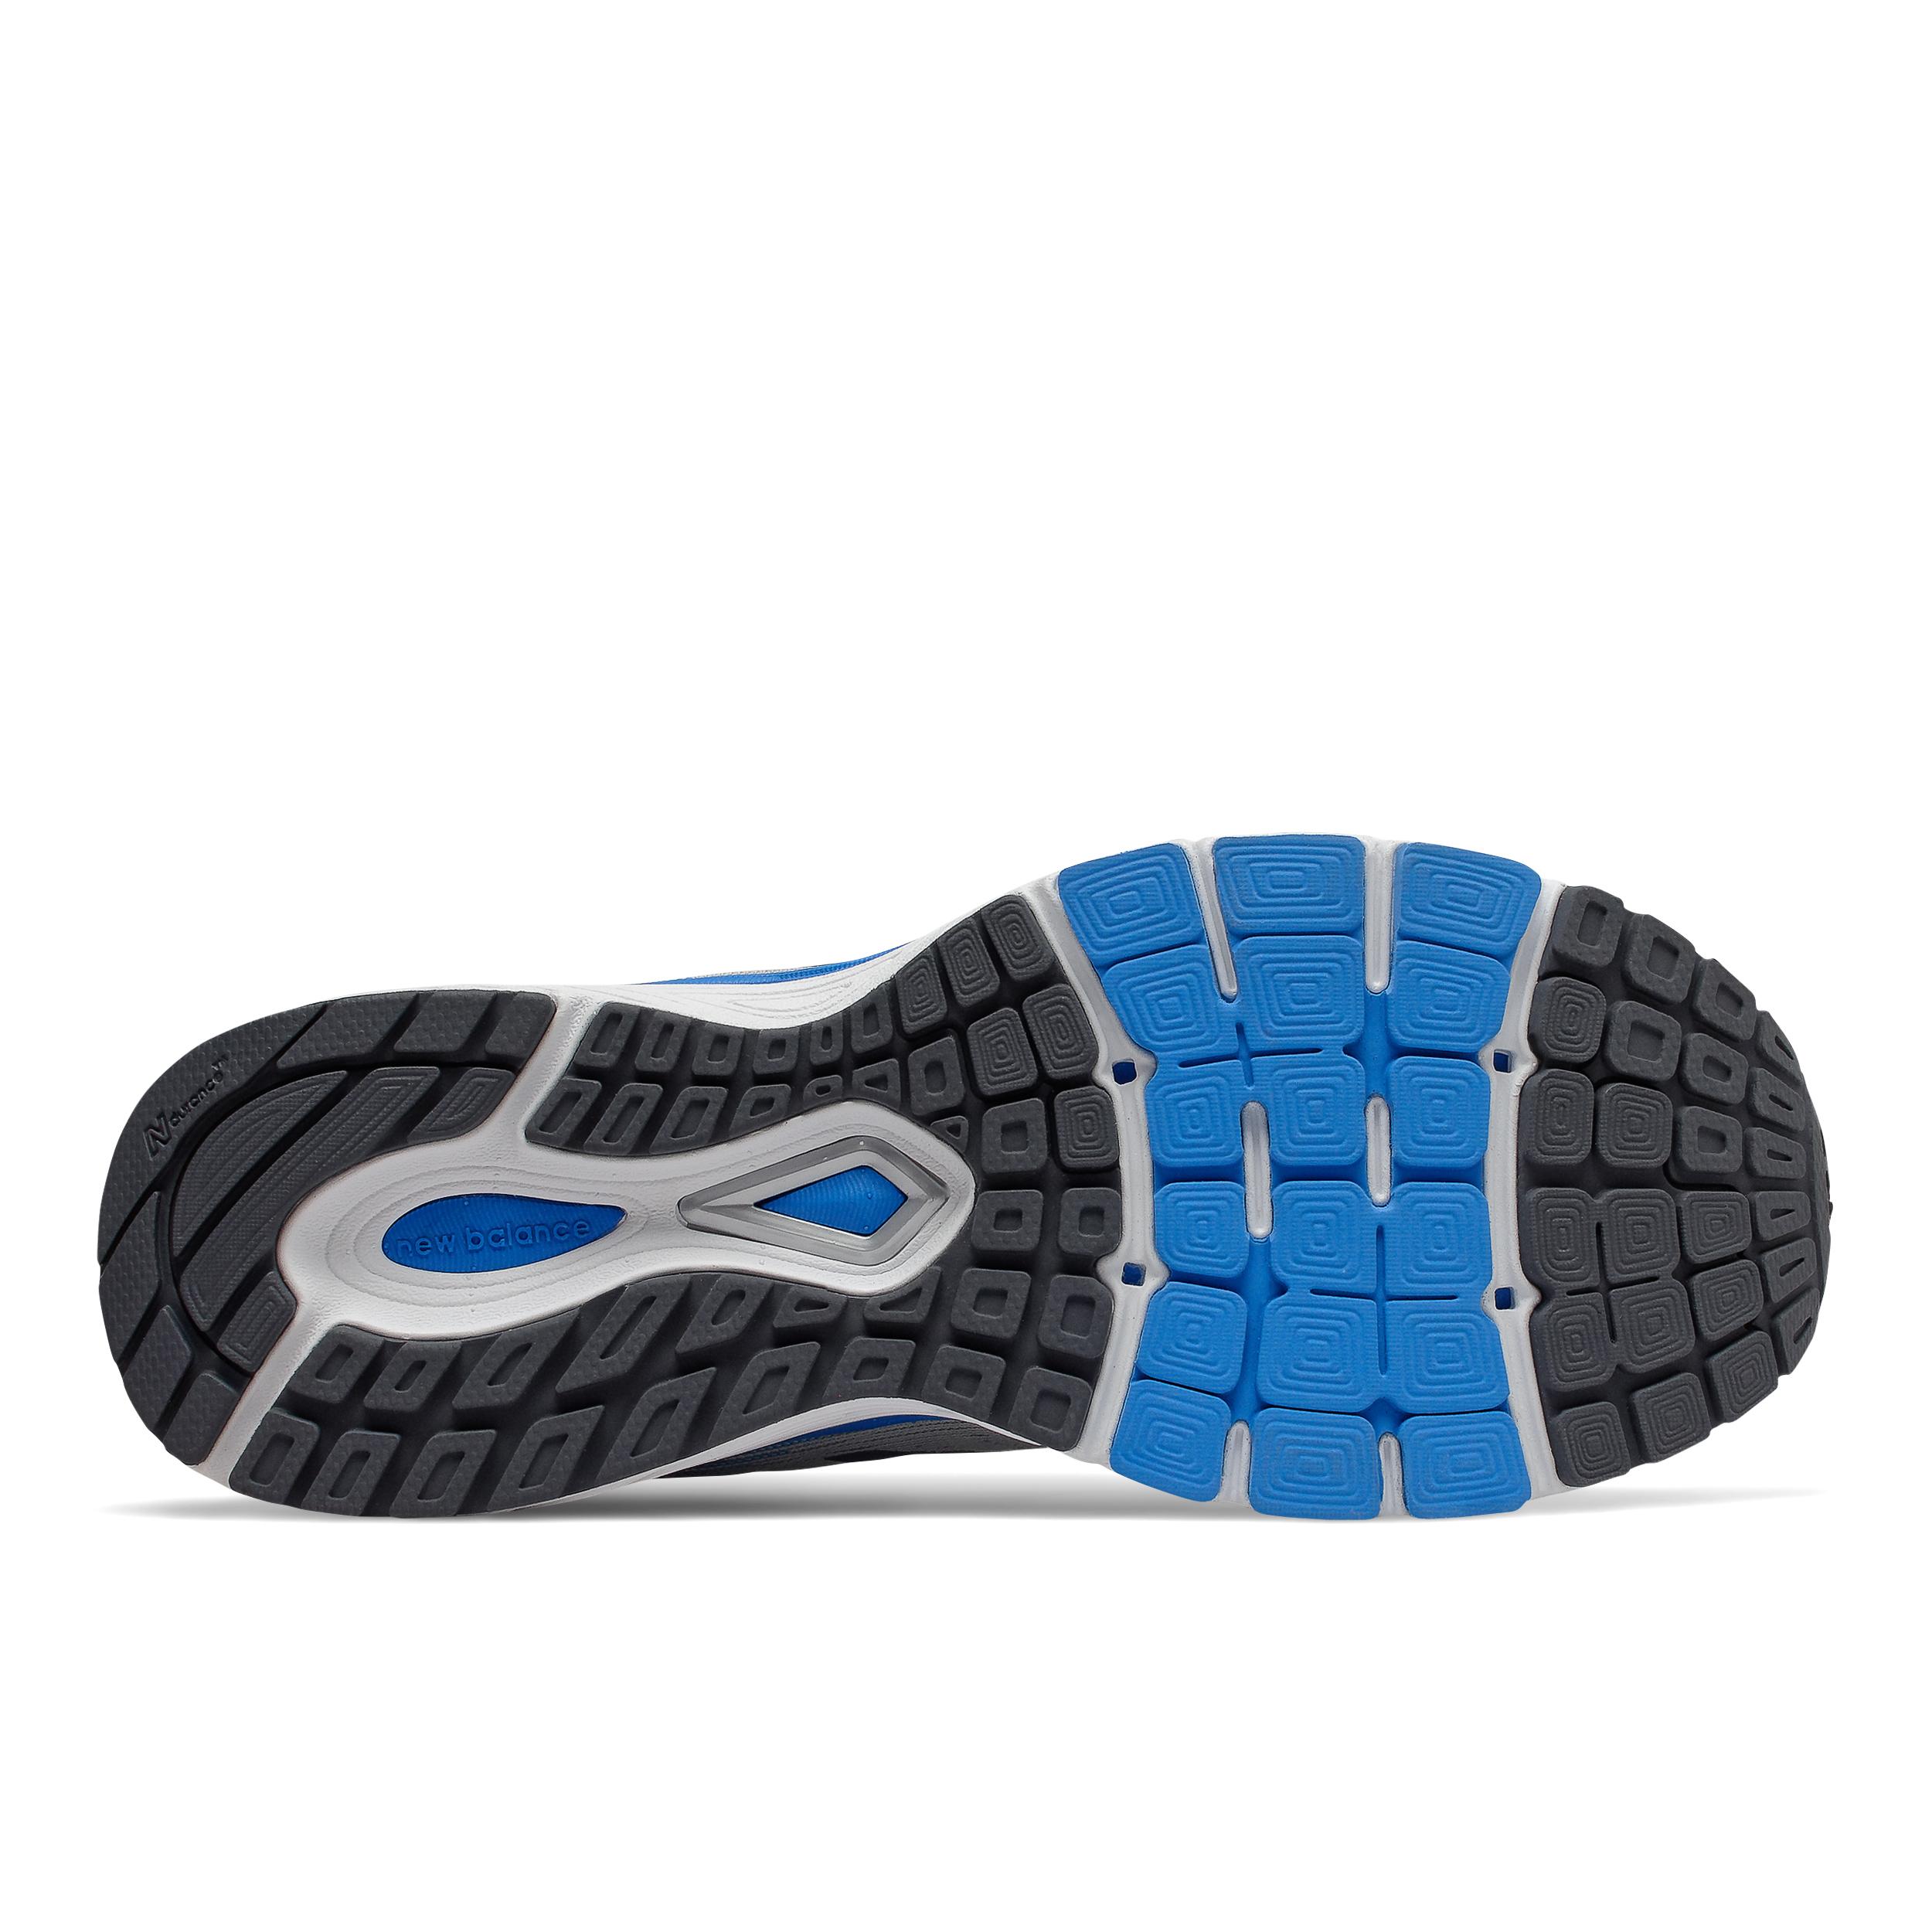 New Balance Solvi V2 Road Running Shoes